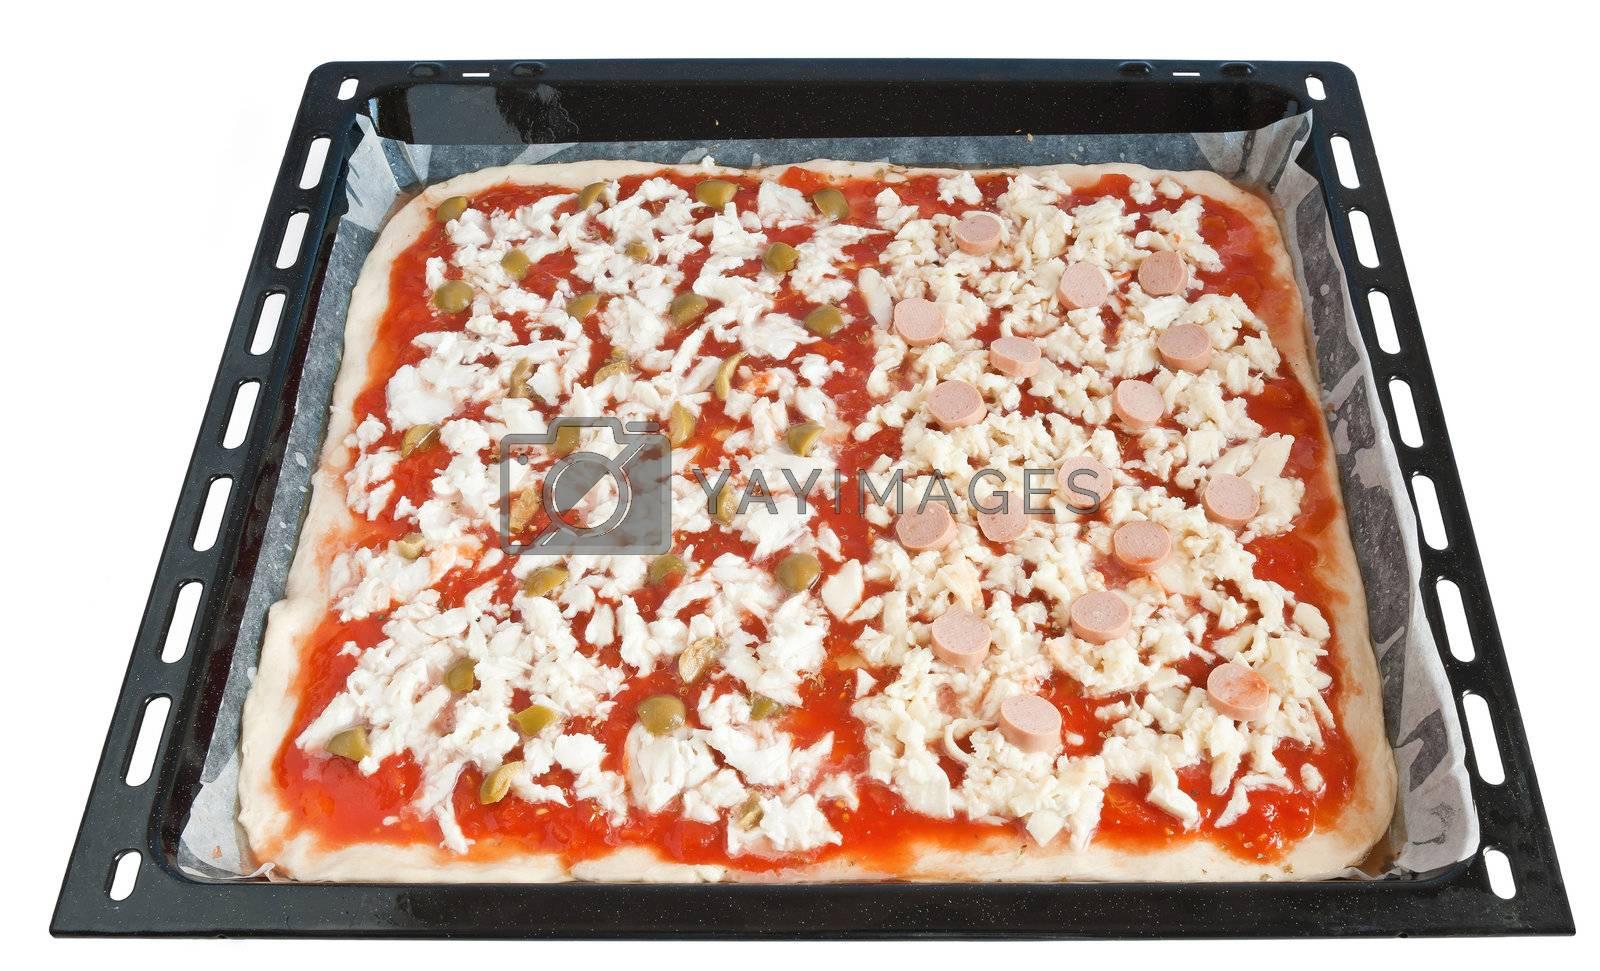 Royalty free image of baking pan with pizza by antonioscarpi